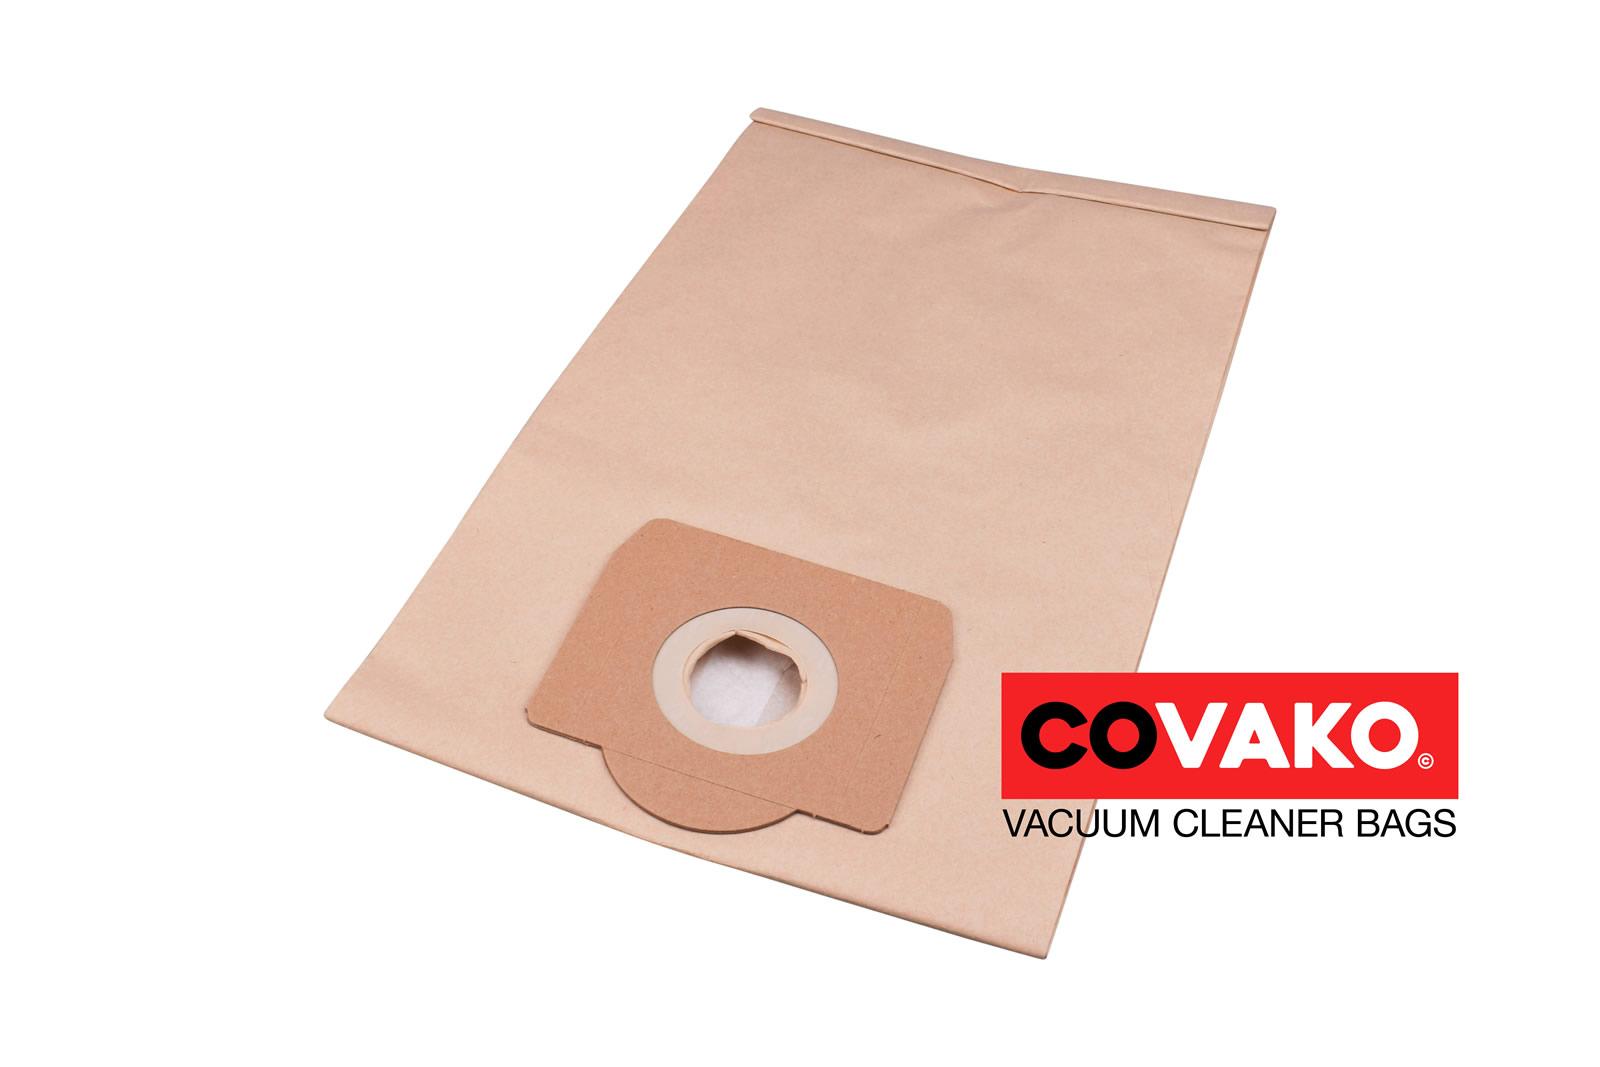 Gansow GP 1/16 Dry / Paper - Gansow vacuum cleaner bags